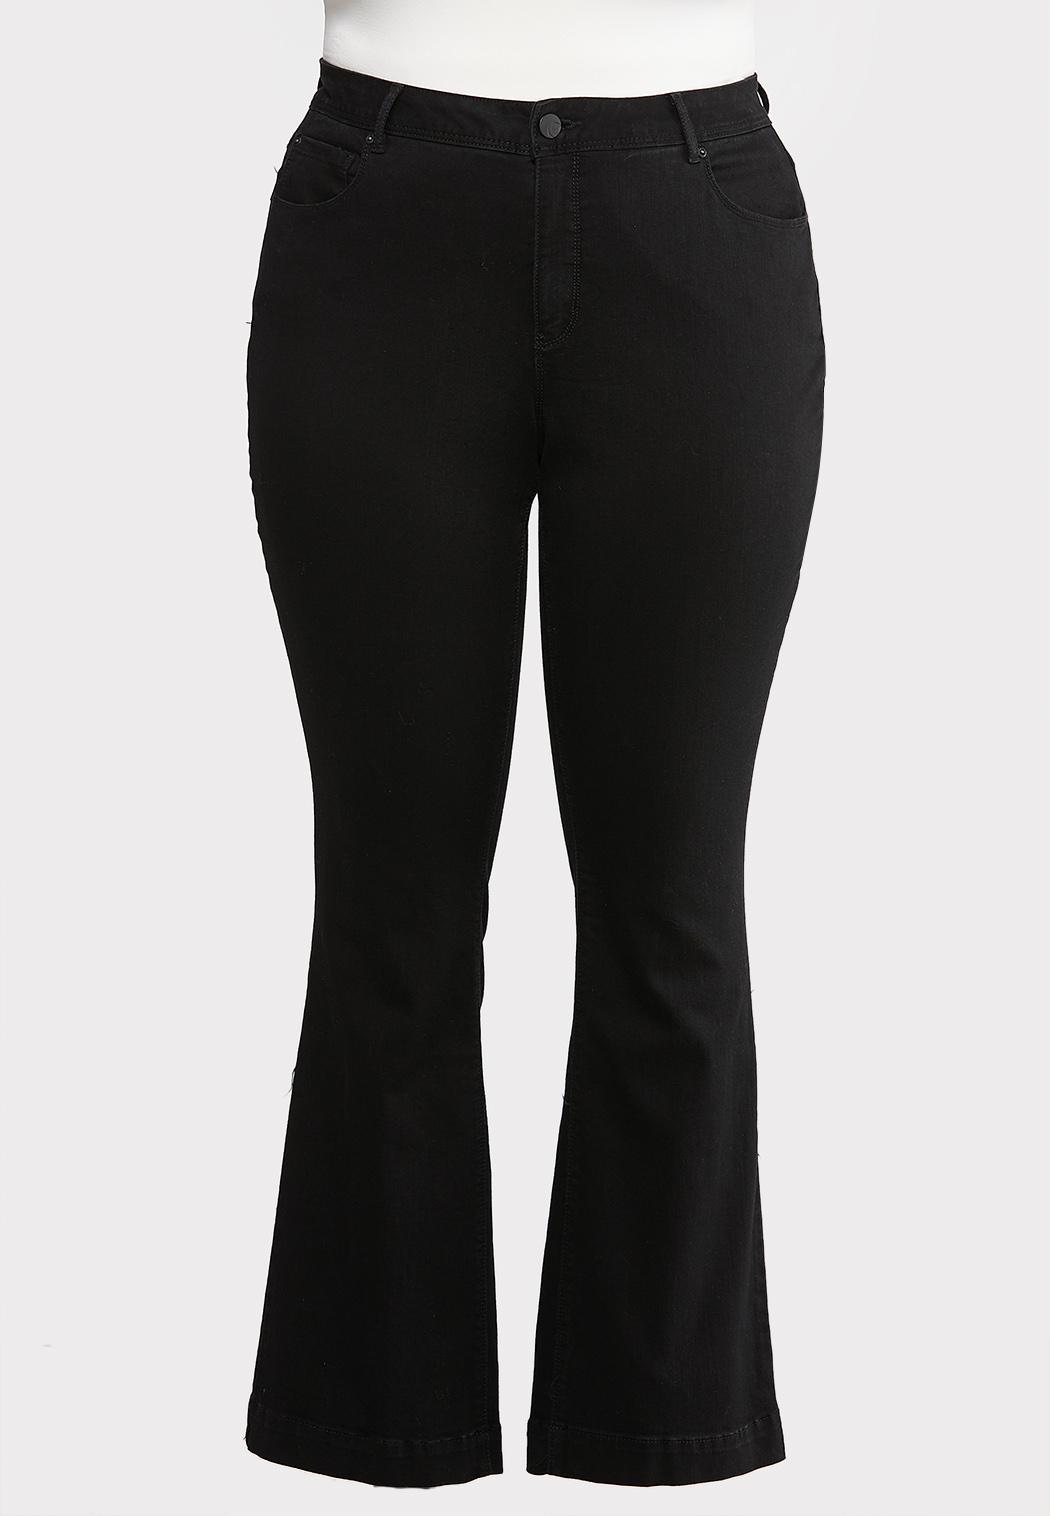 Plus Petite Black Bootcut Jeans